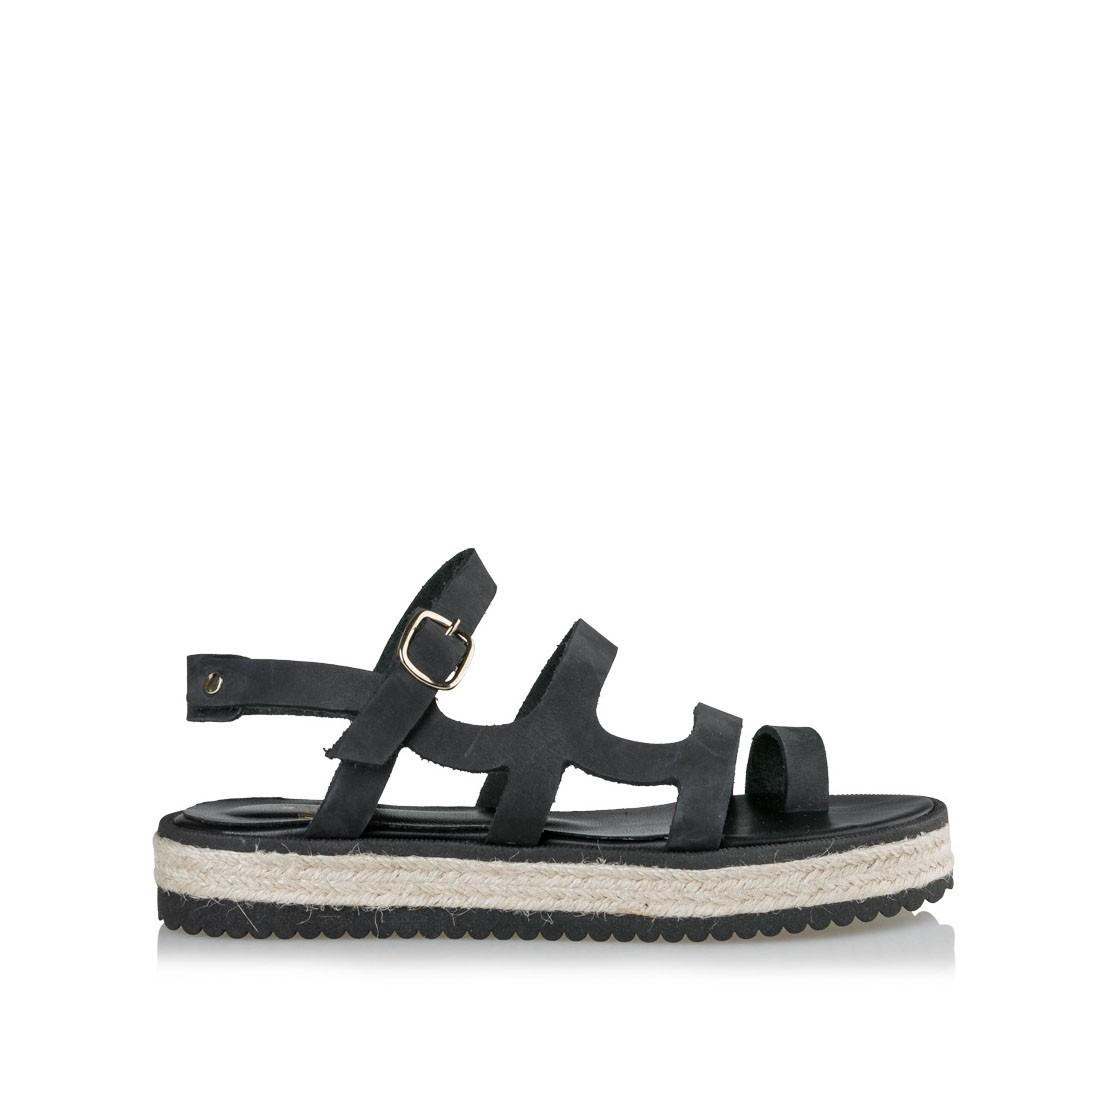 1cb1fd6d938 Mairiboo by Envie Shoes Γυναικεία Πέδιλα M03-07552-34 Μαύρο ...